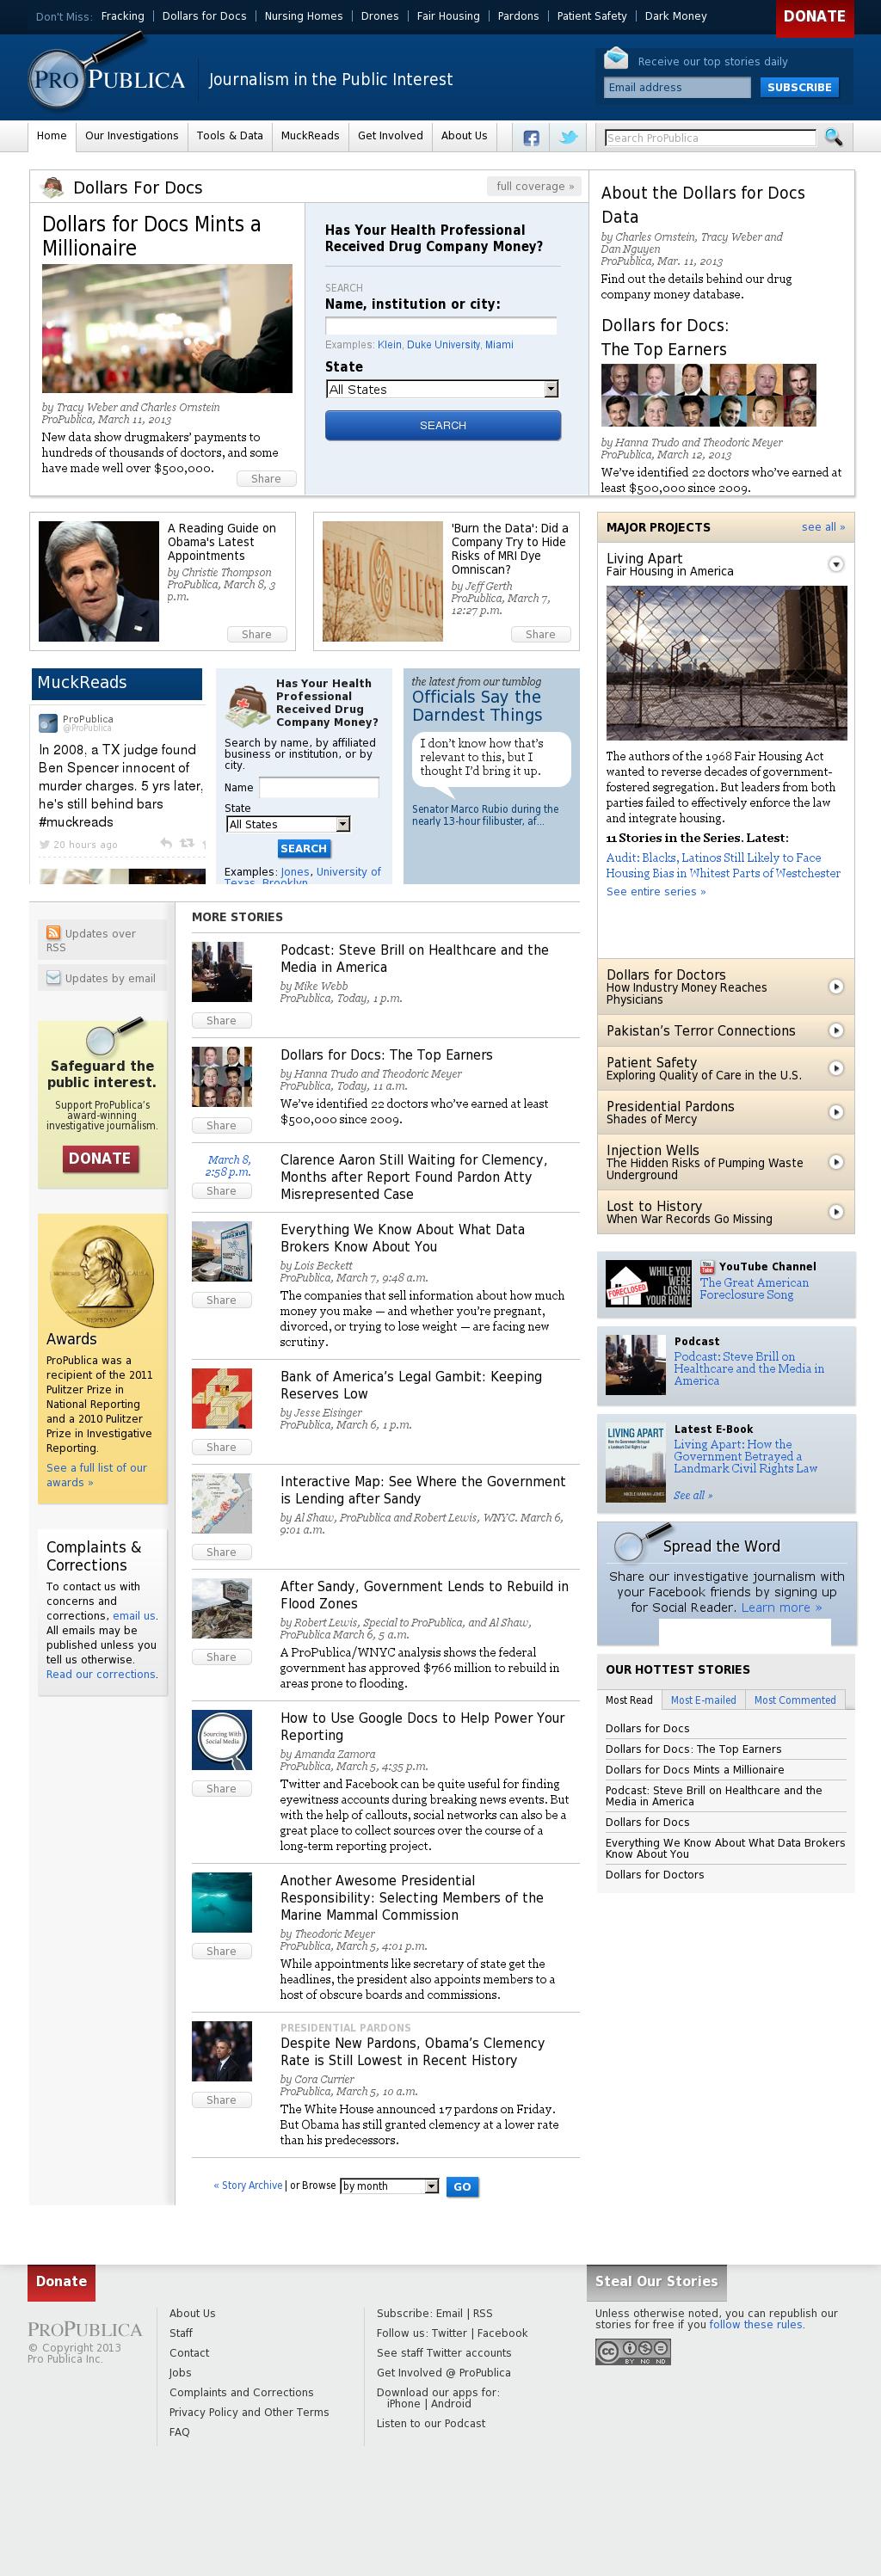 ProPublica at Tuesday March 12, 2013, 7:17 p.m. UTC